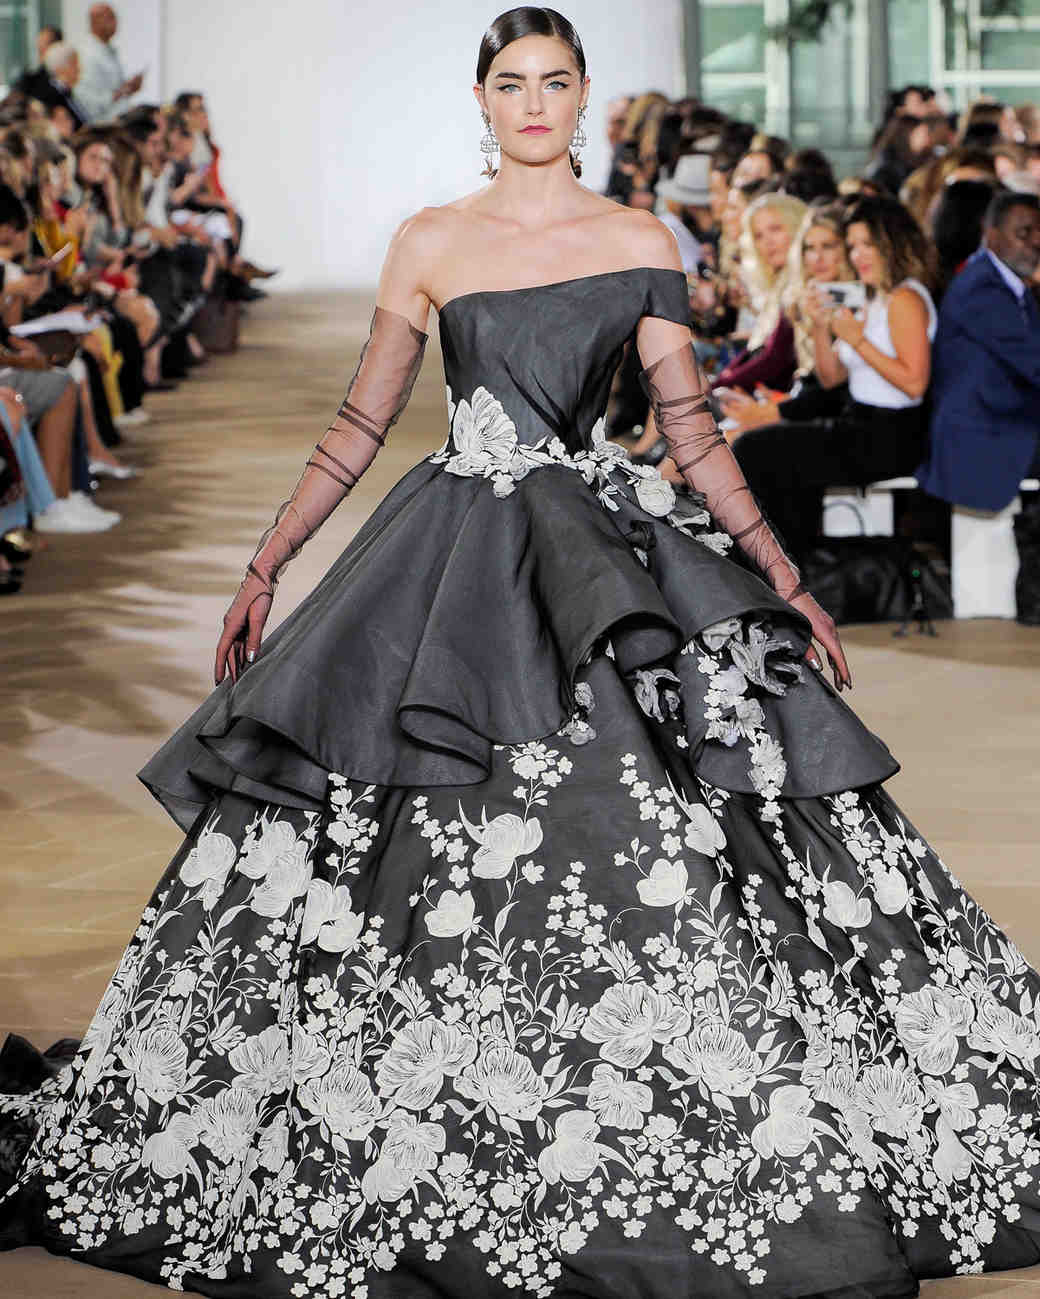 Black and White Brides Dresses